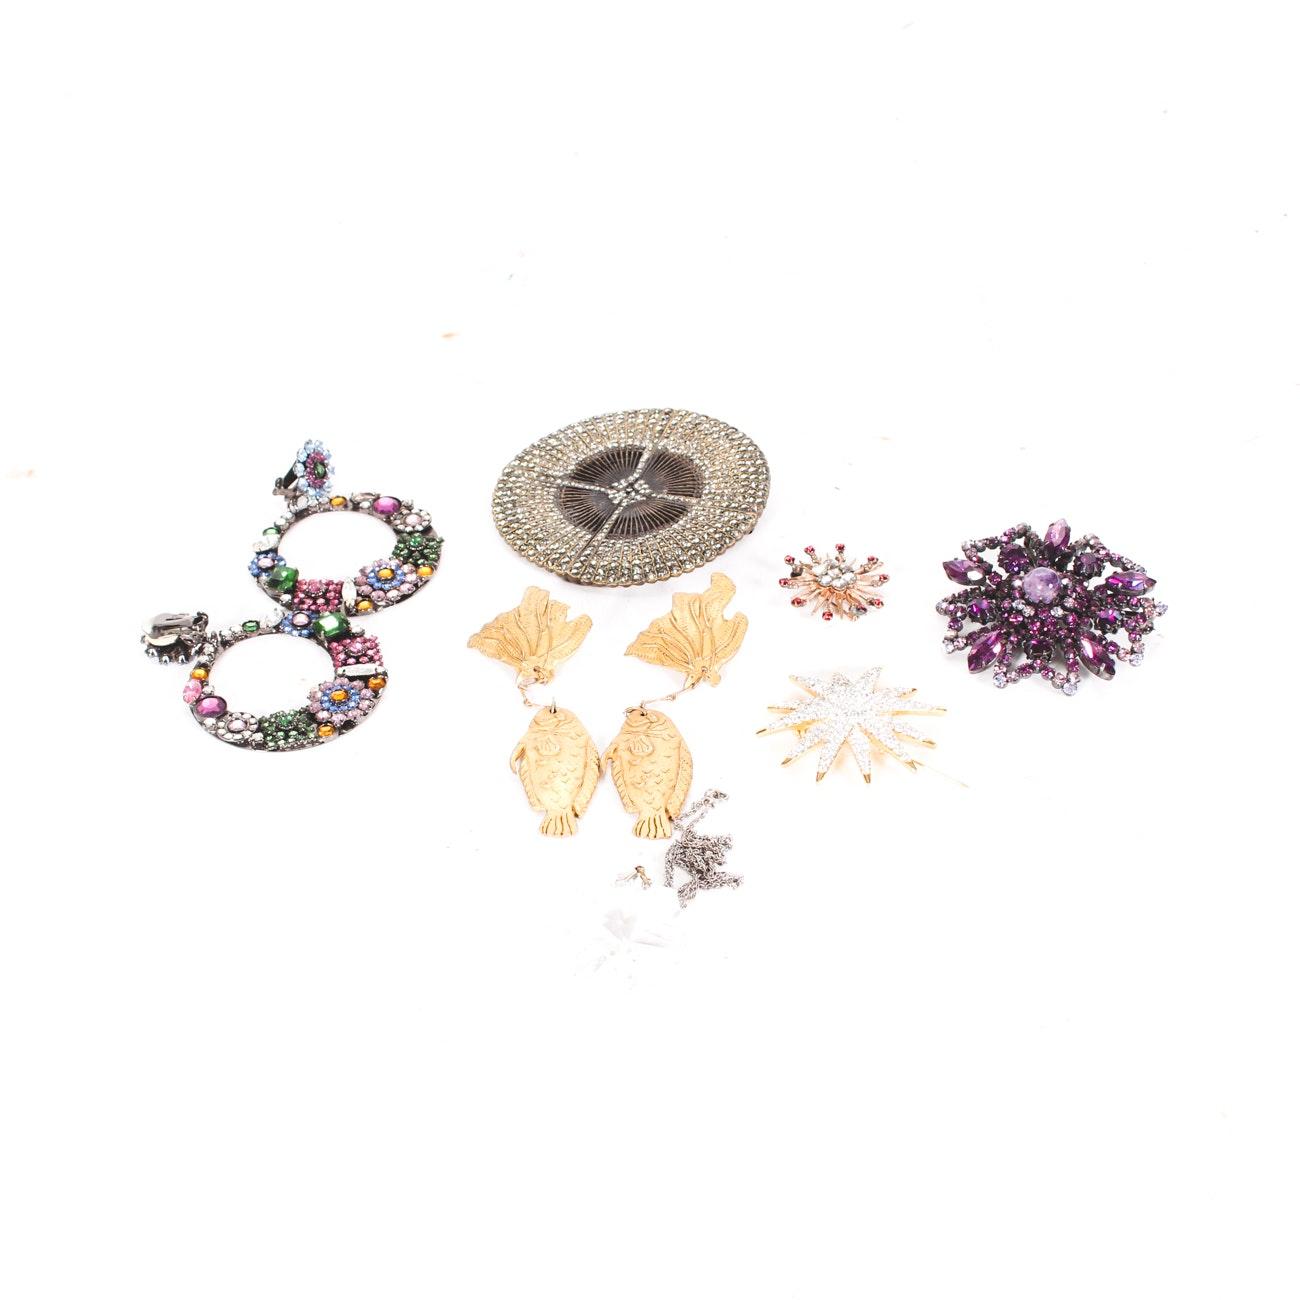 Assortment of Fashion Jewelry Featuring Heidi Daus, Sorrelli, and Swarovski